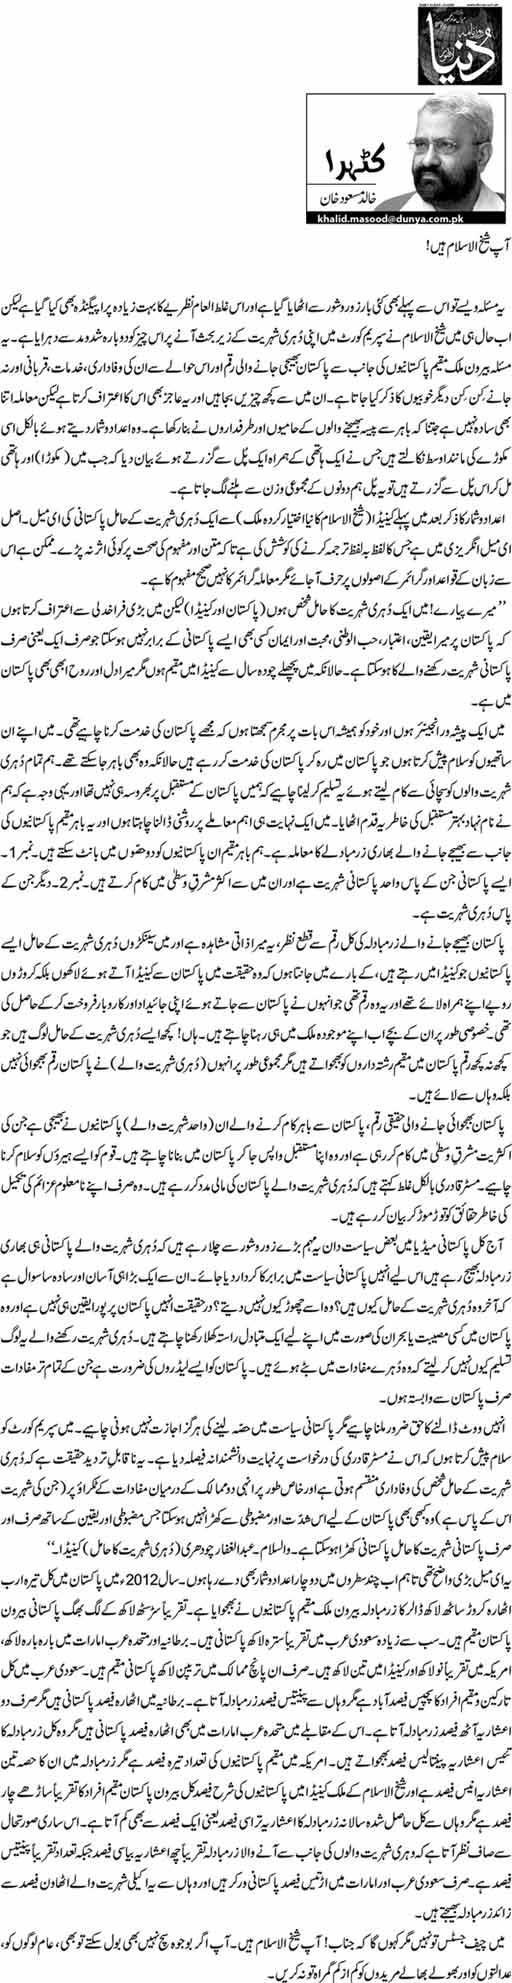 Aap Sheikh ul Islam hain! - Khalid Masood Khan